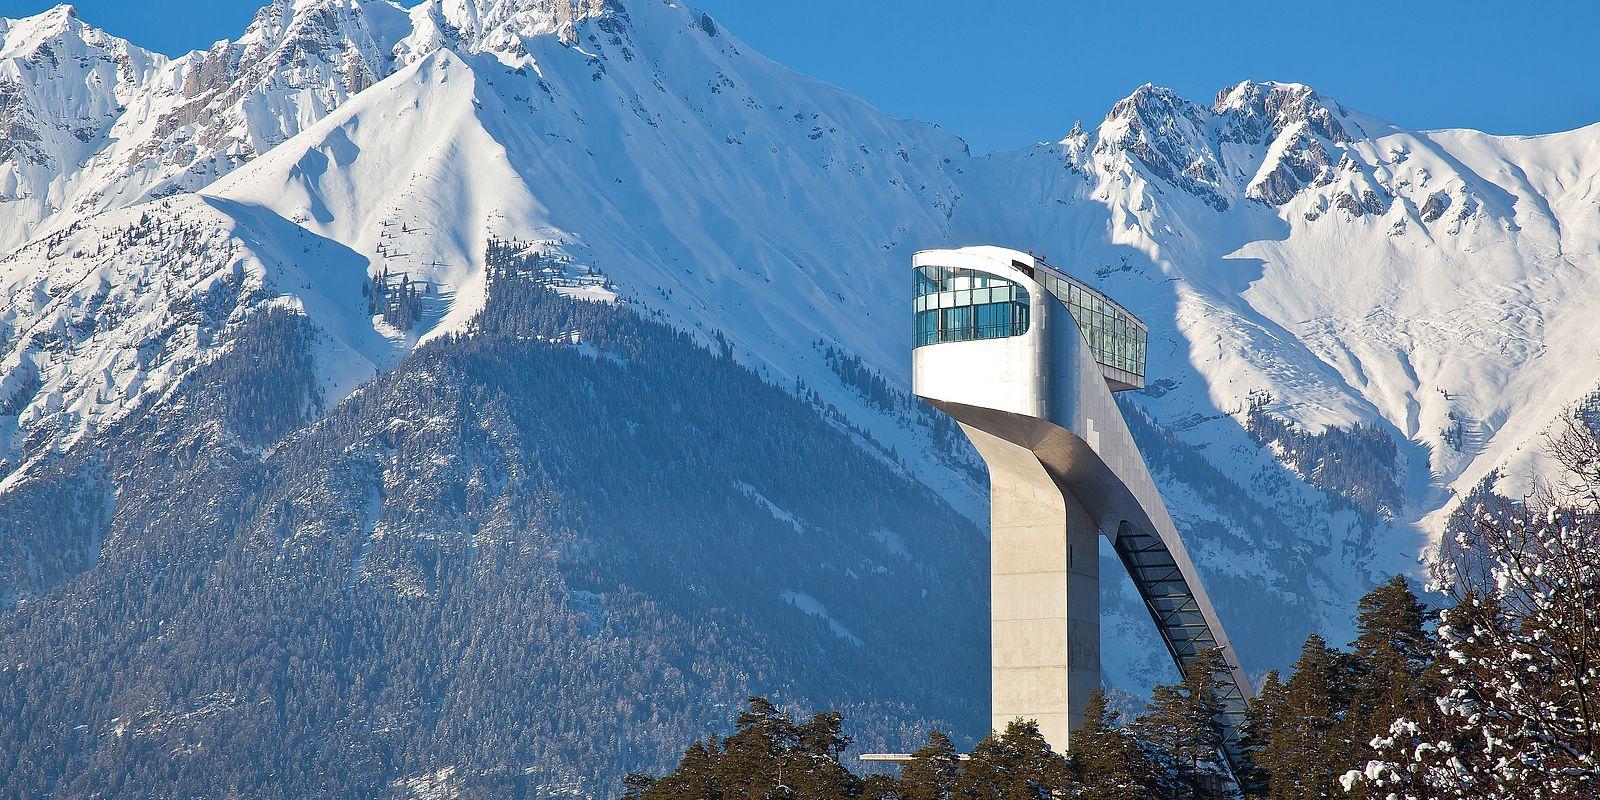 Bergisel Sprungschanze in Innsbruck © Innsbruck Tourismus / Christof Lackner